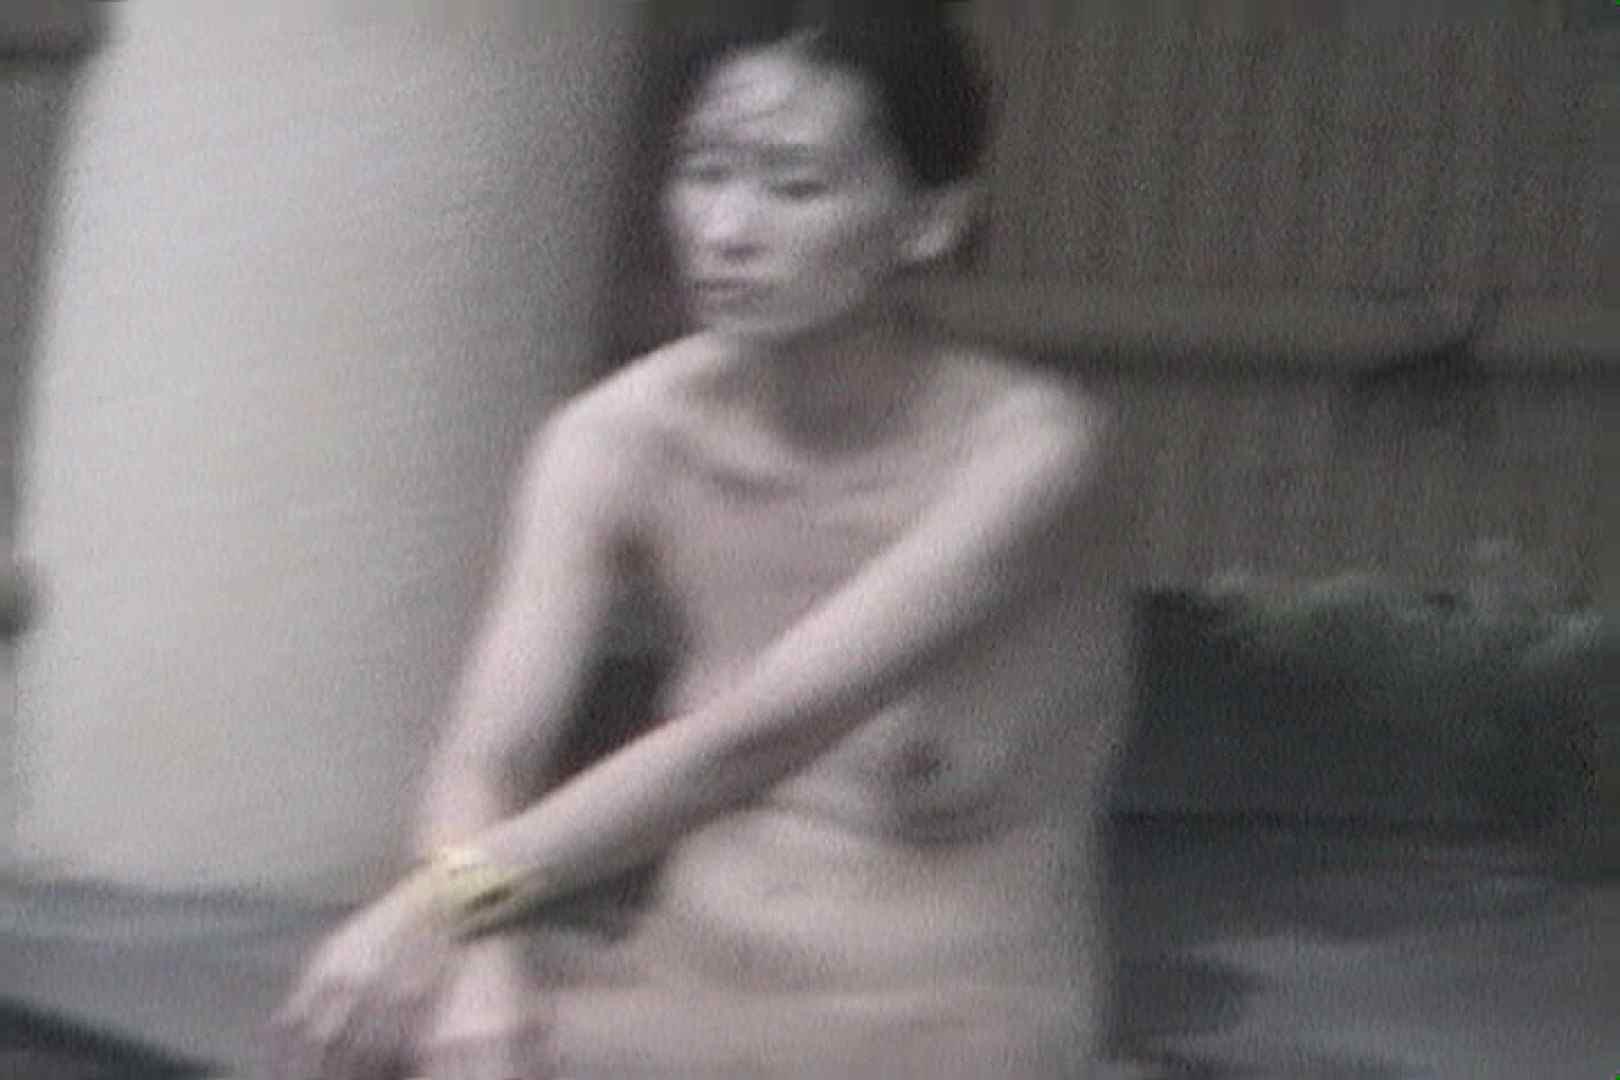 Aquaな露天風呂Vol.557 露天風呂編  100PIX 68